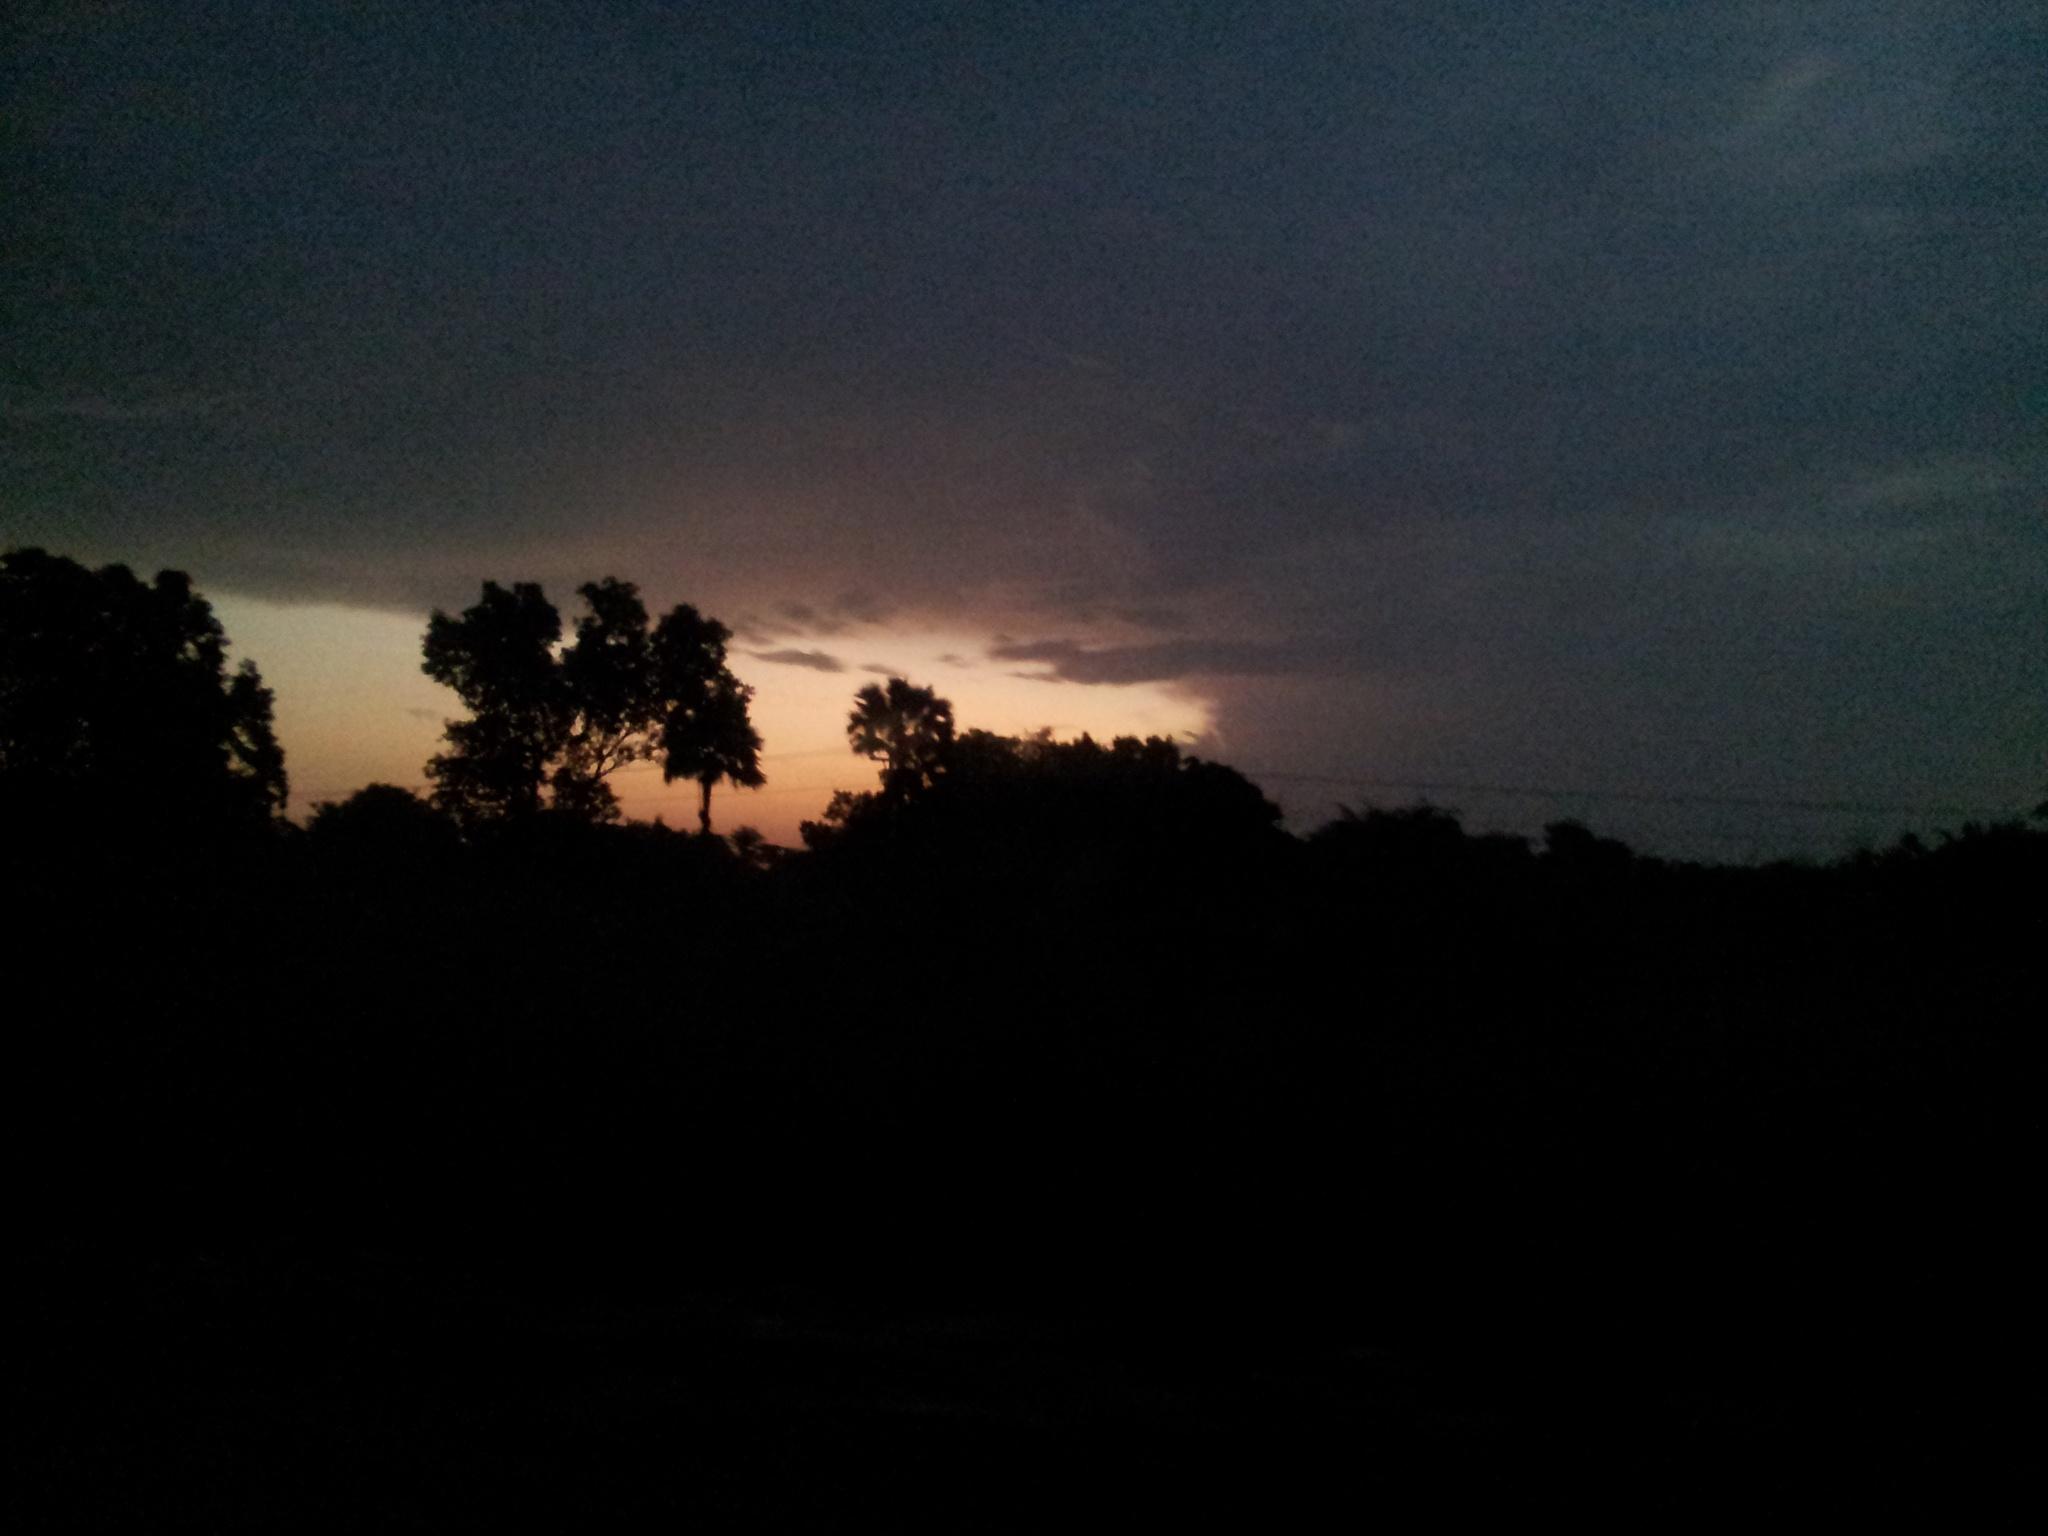 The falling evening by Suresh Tewari